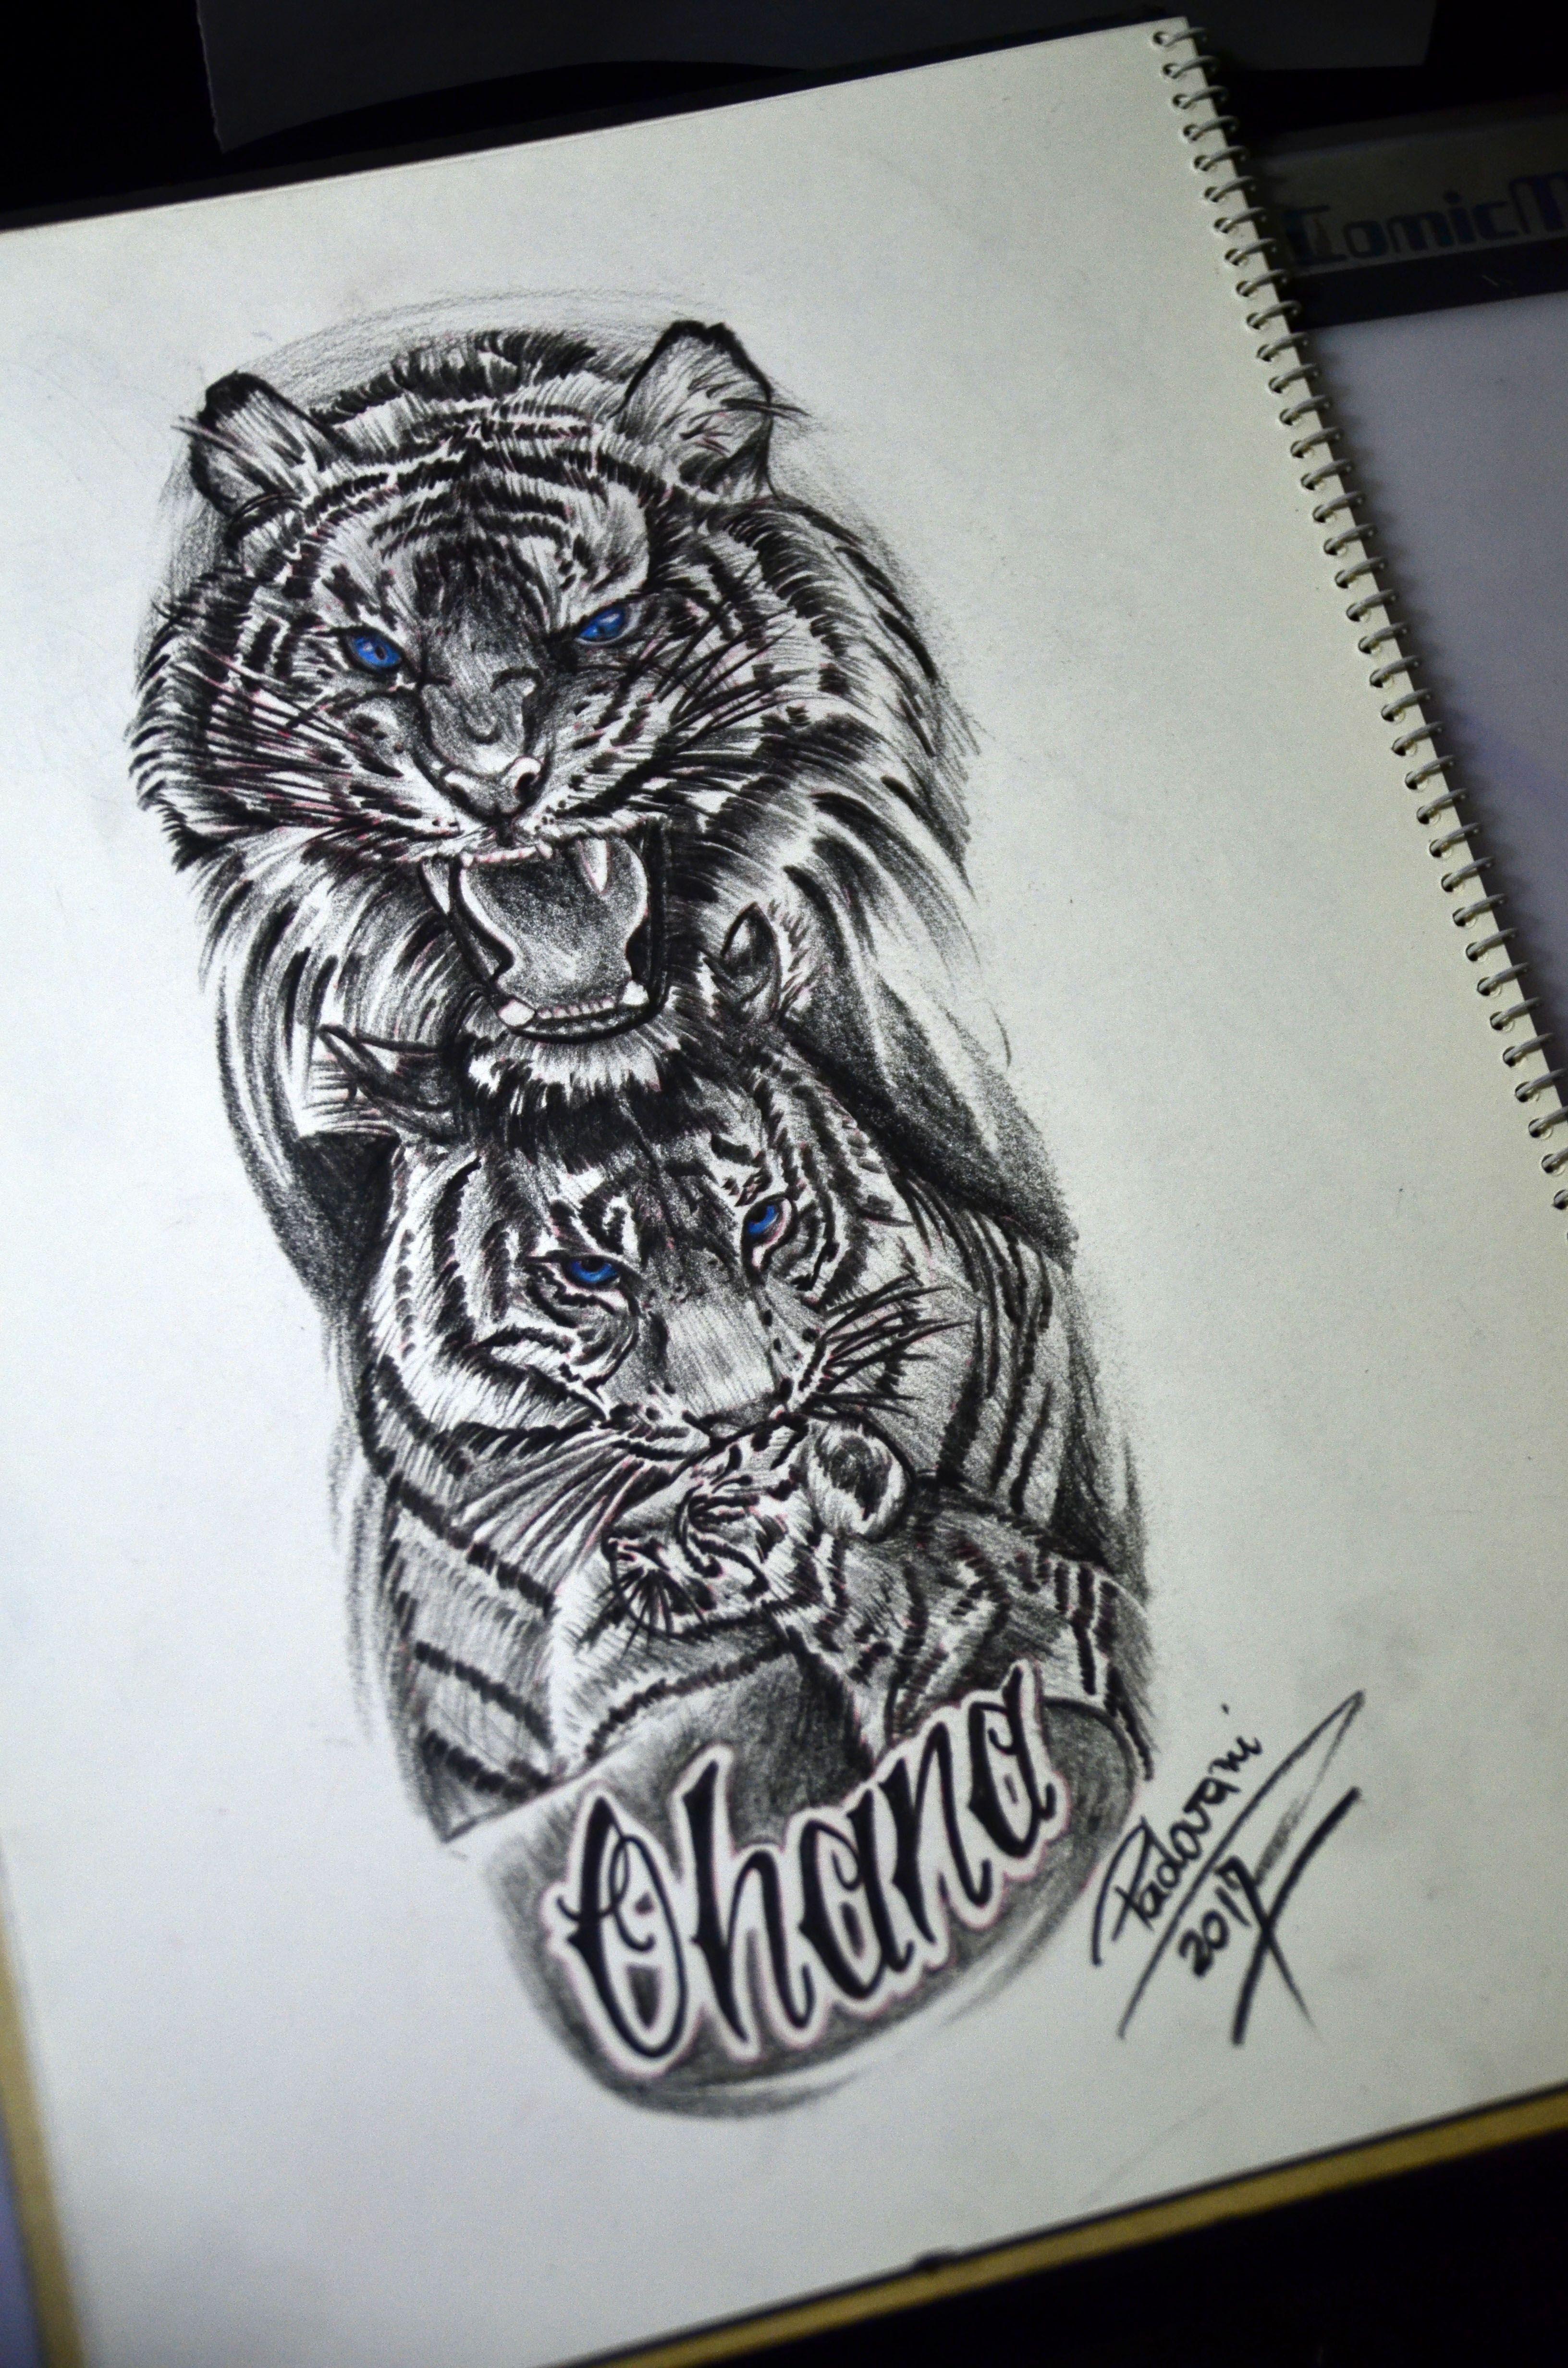 Family Tiger Tattoo Sketch By Thiago Padovani Tattoos To My Soul